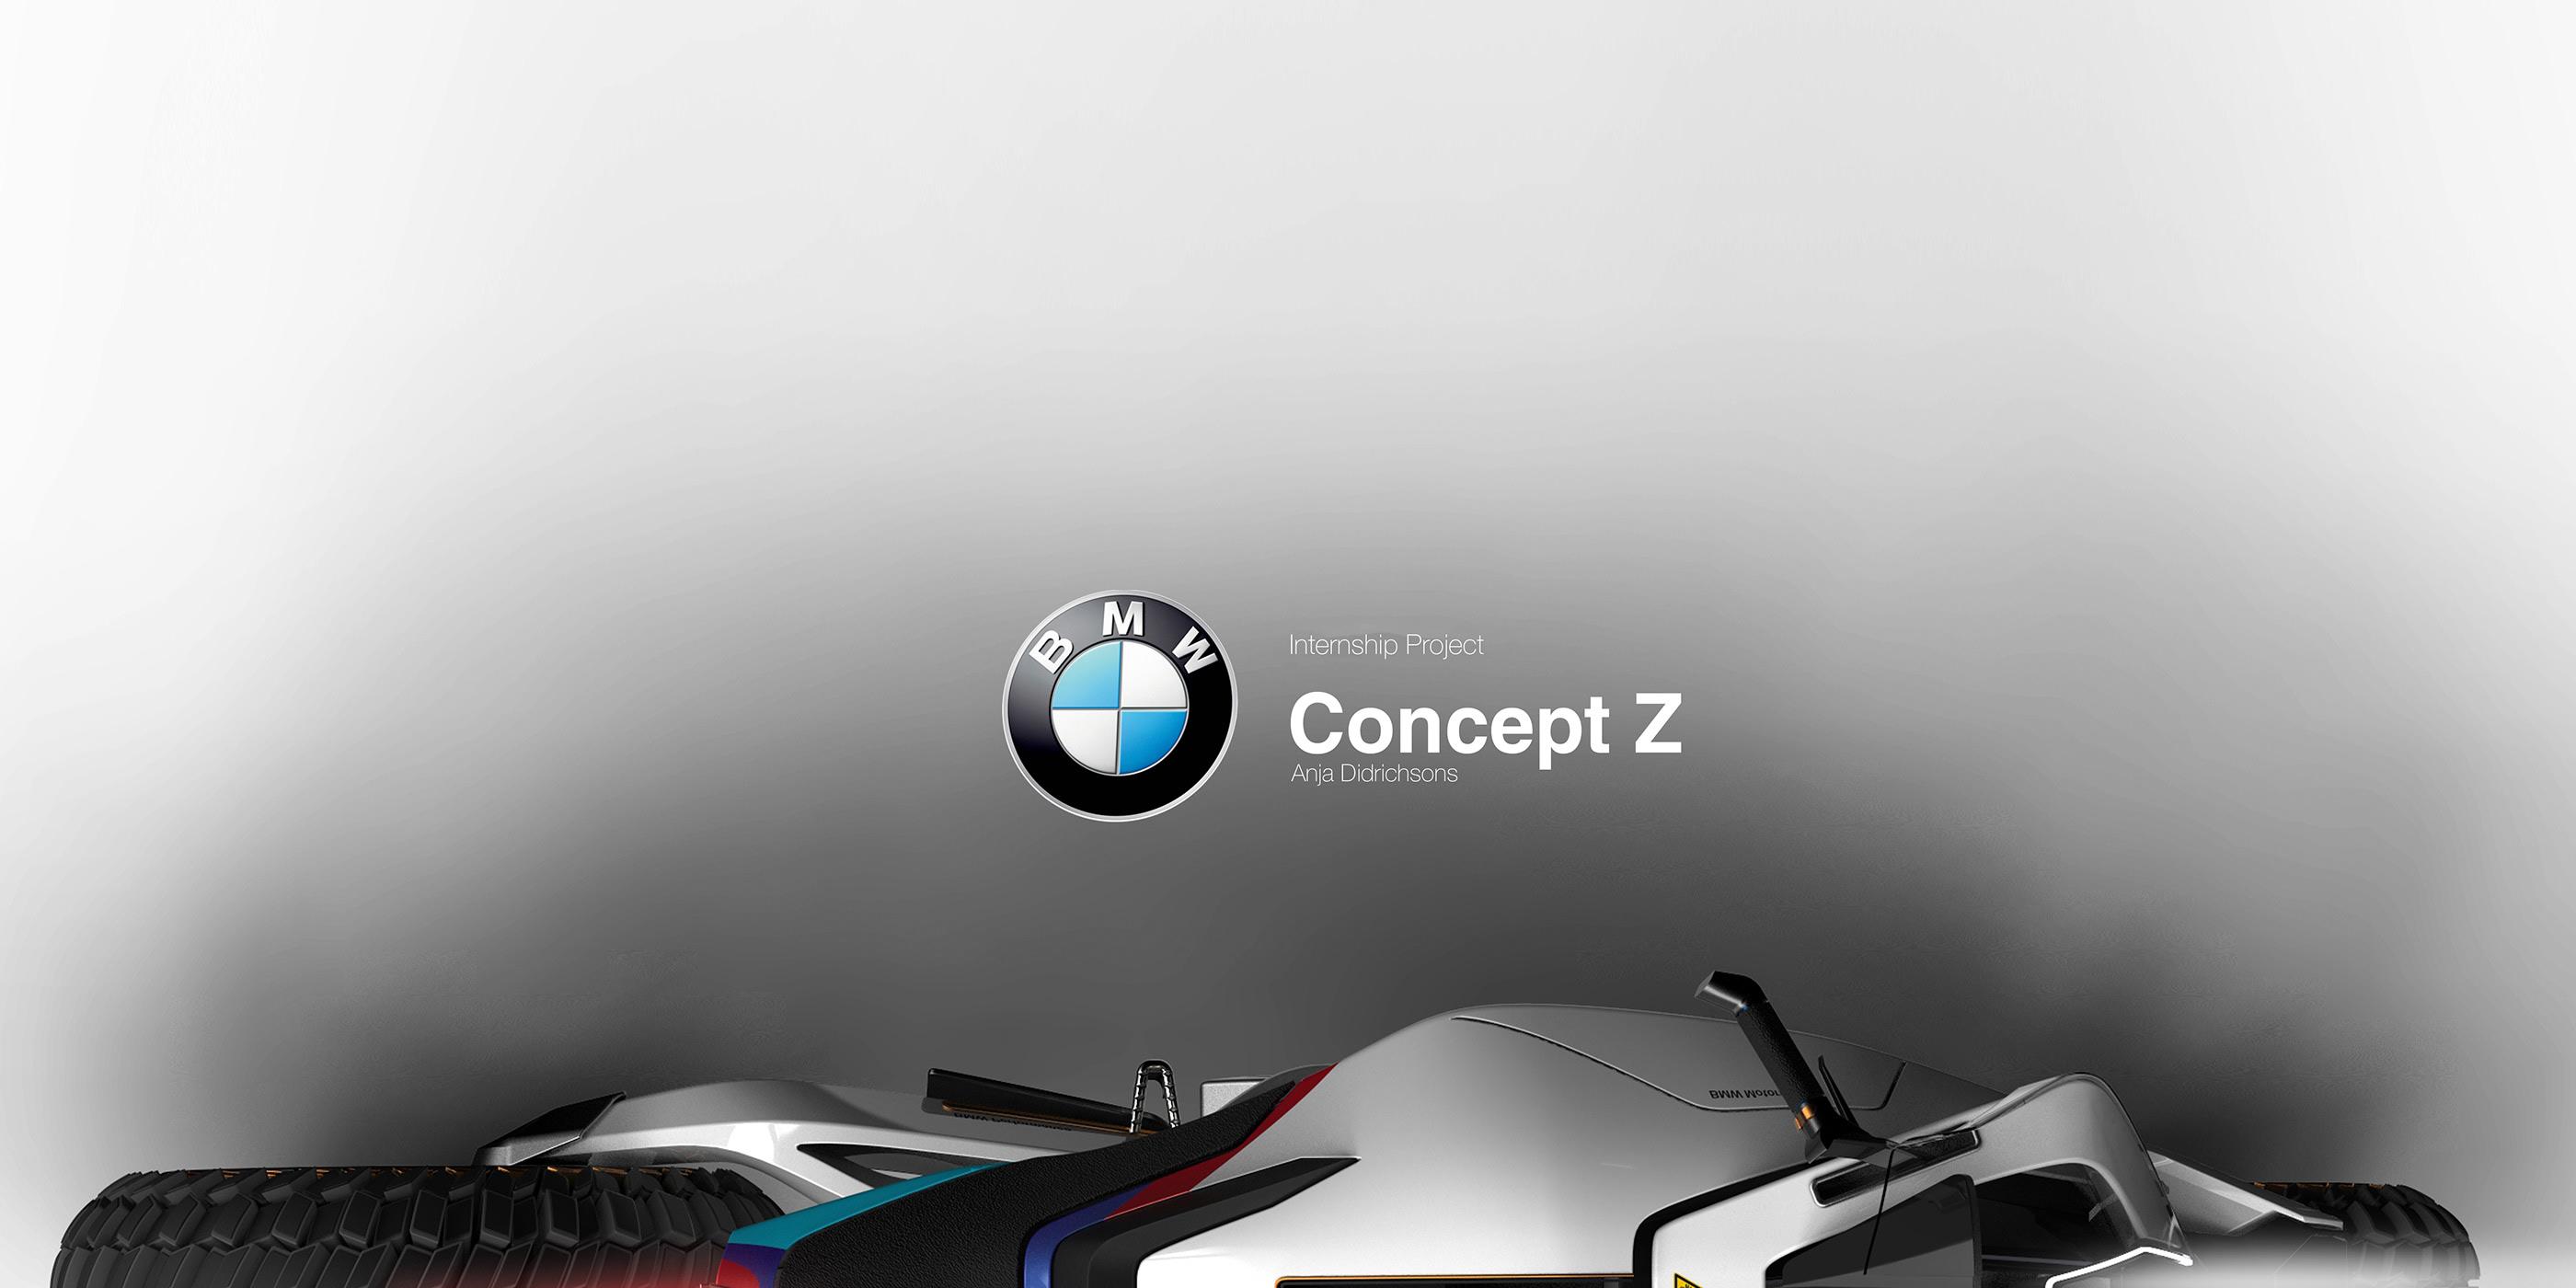 Bmw Motorrad Internship Project Concept Z On Behance